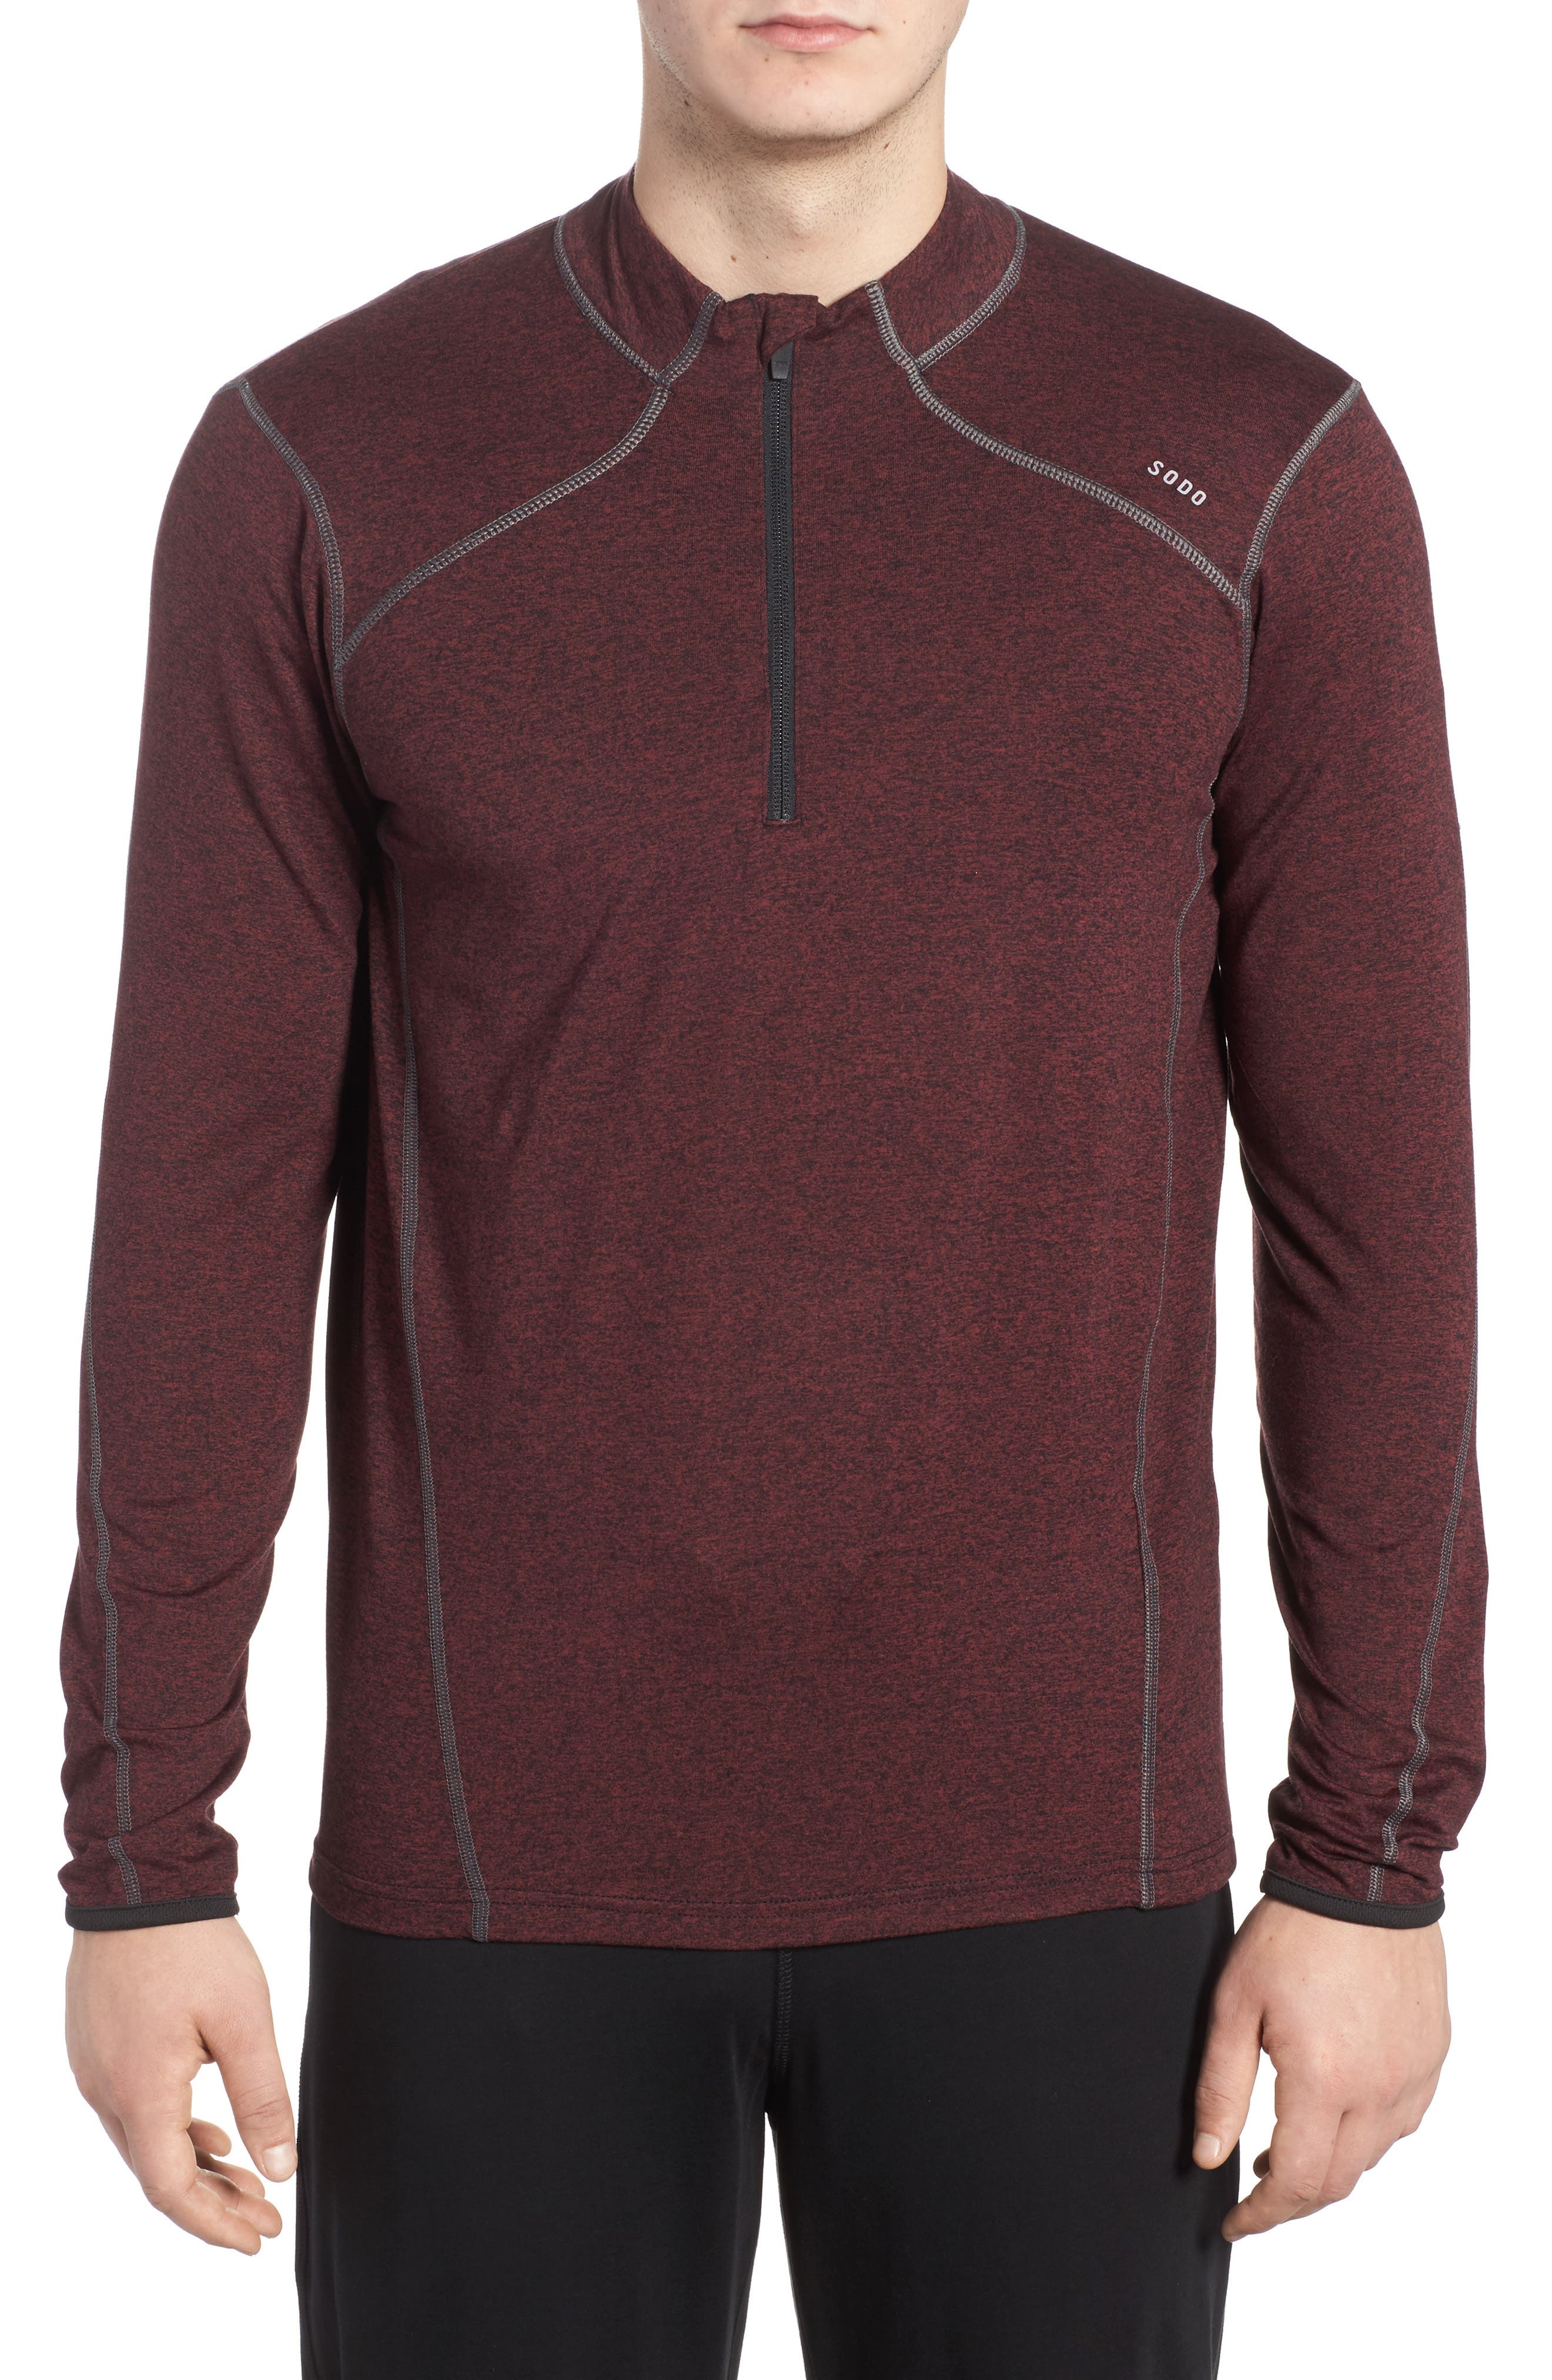 Main Image - SODO 'Elevate' Moisture Wicking Stretch Quarter Zip Pullover